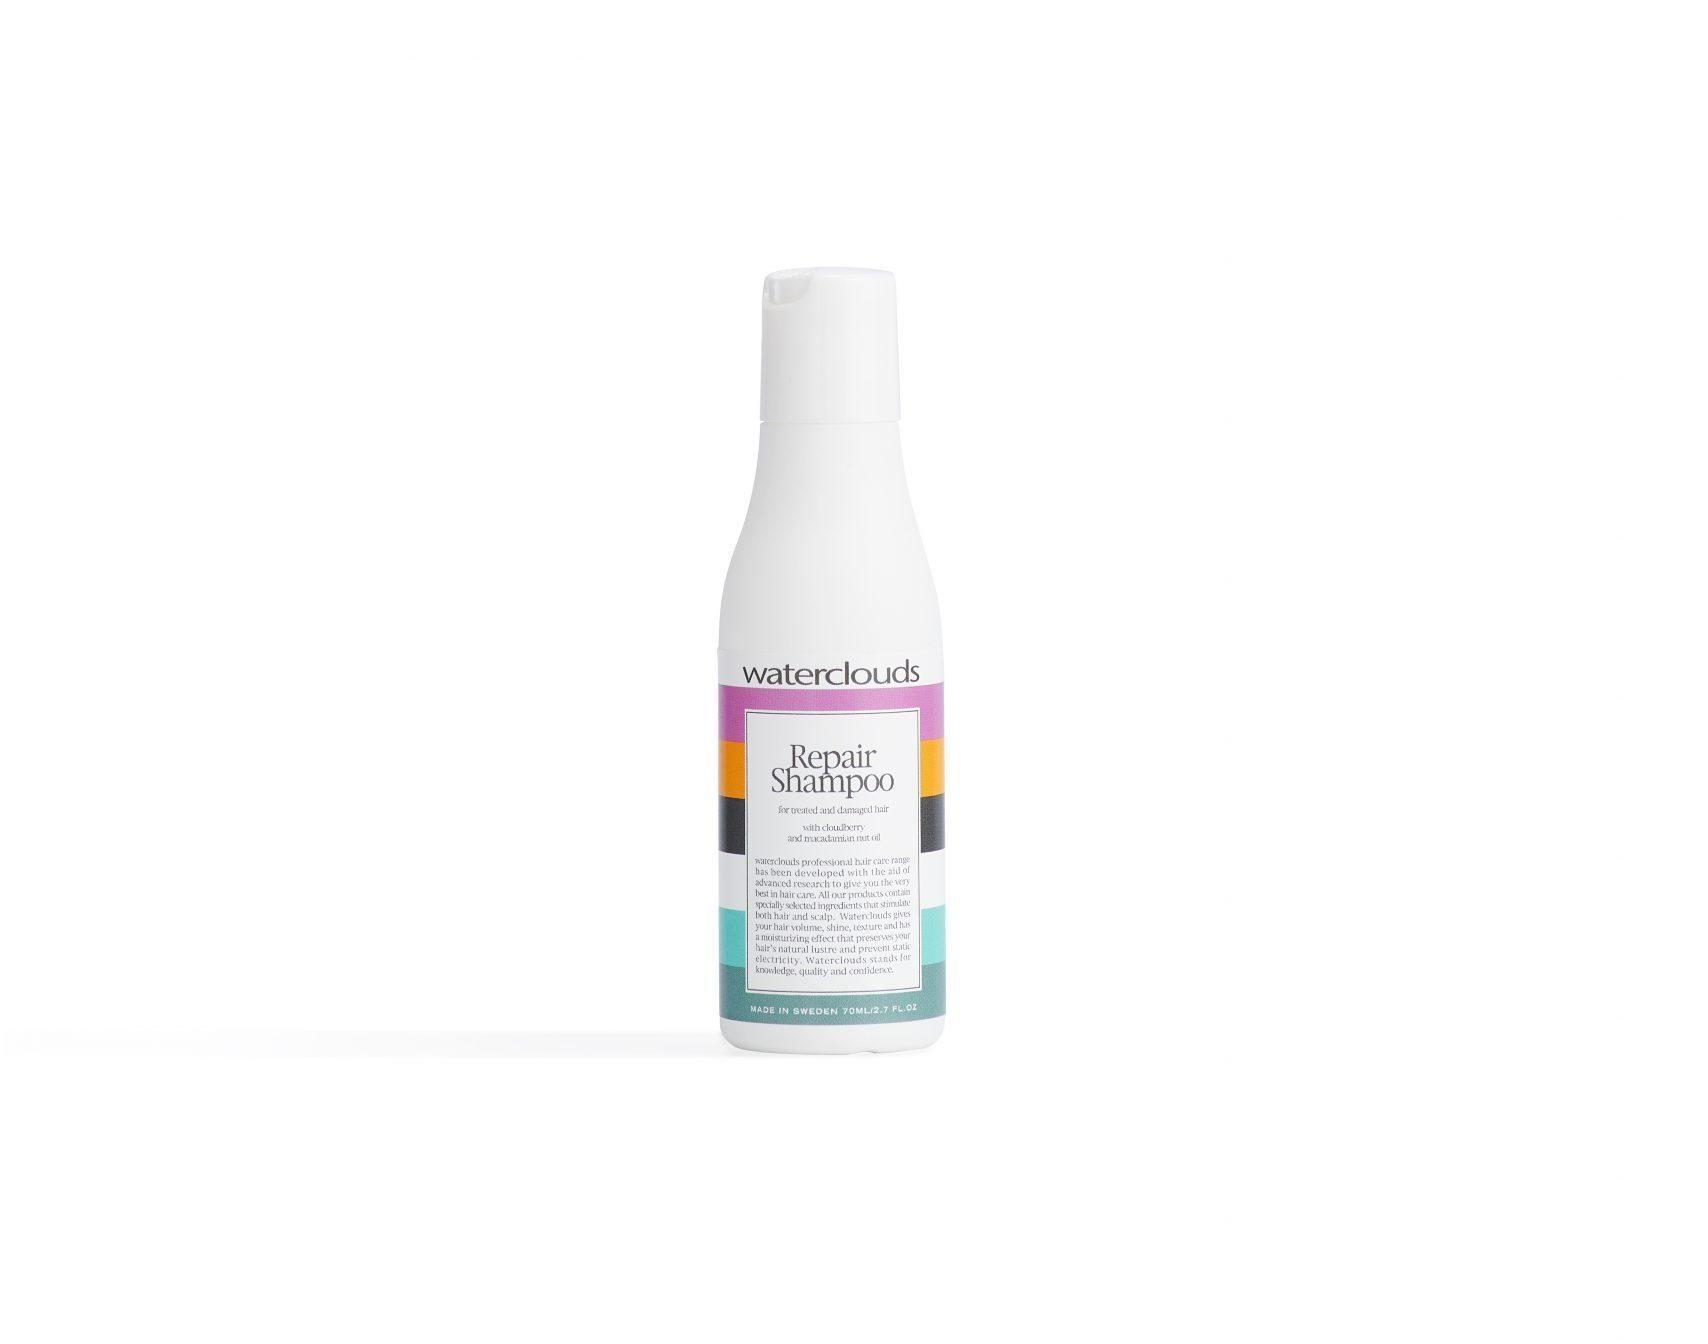 Repair shampoo 70ml – Waterclouds